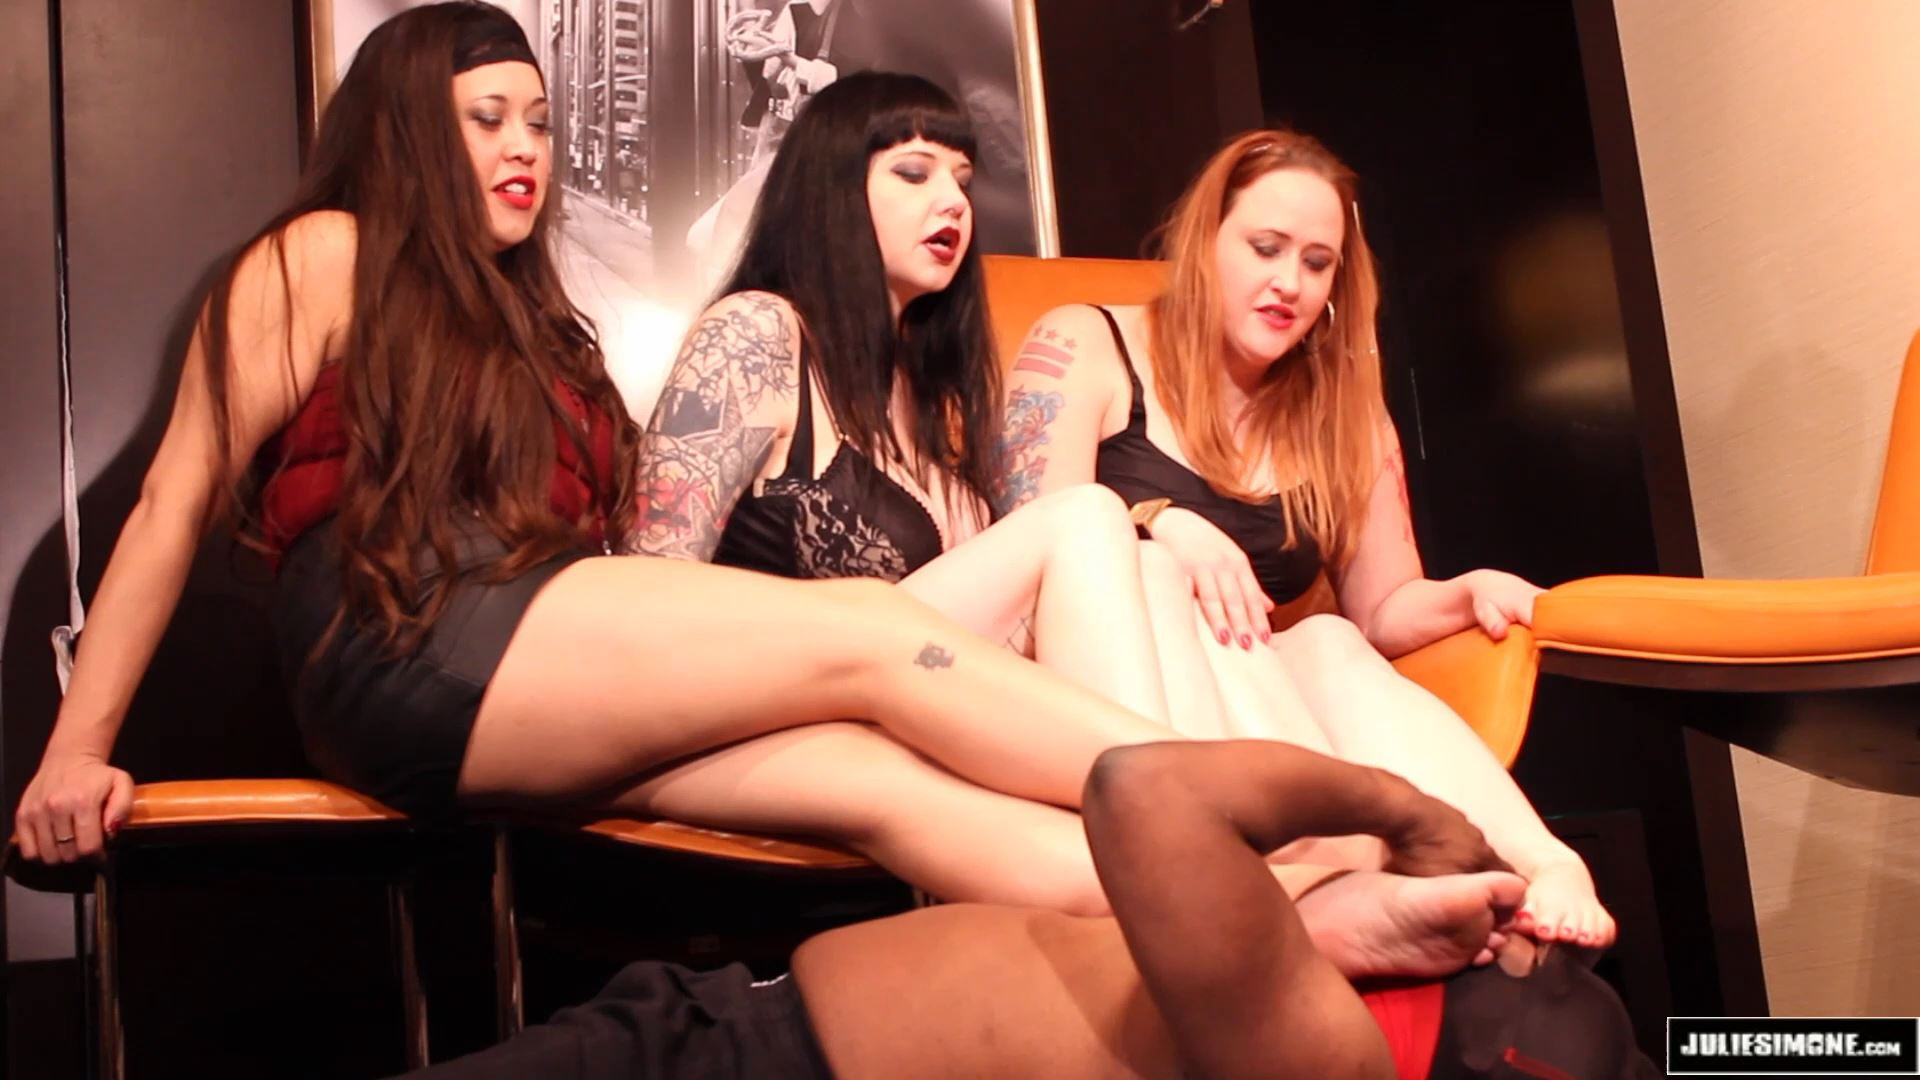 Eden Alexander, Maya Sinstress, Julie Simone In Scene: Foot Slave Auditions Part 2 - JULIESIMONE - FULL HD/1080p/MP4